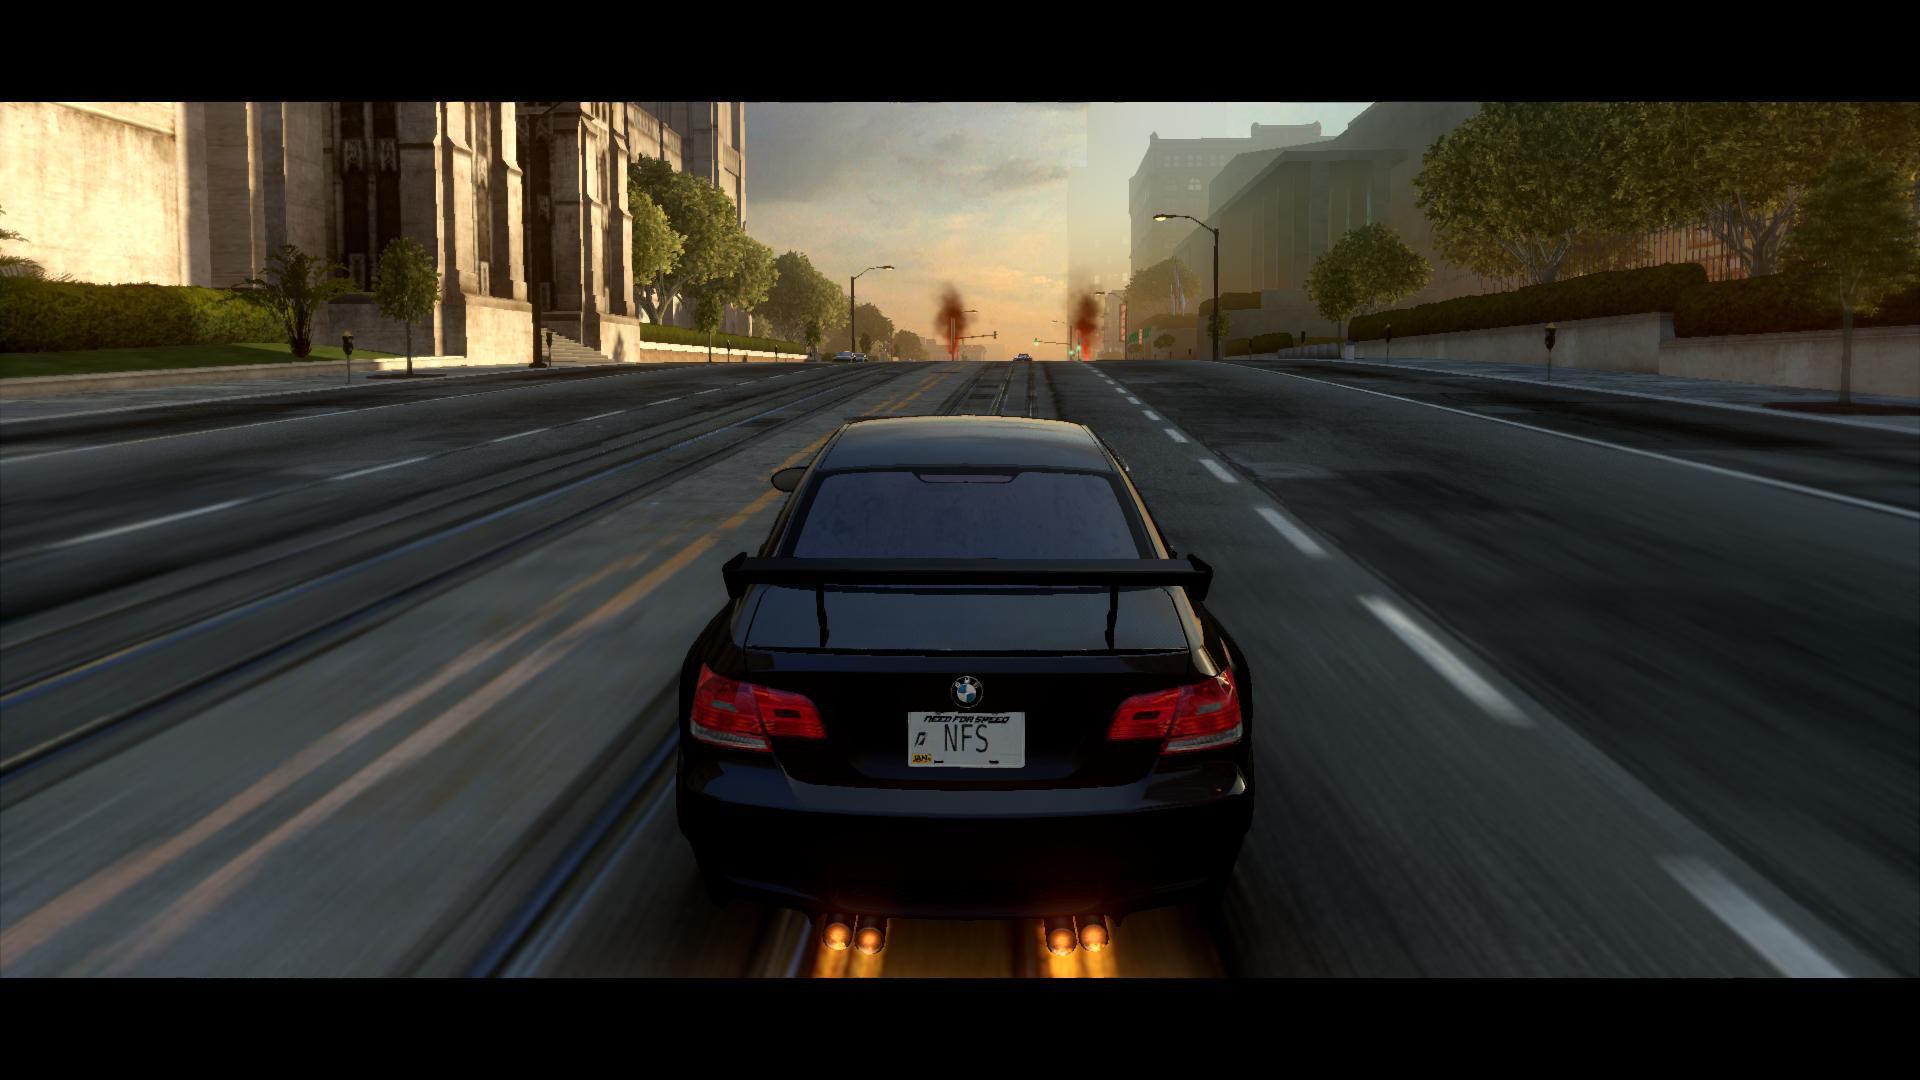 Need For Speed The Run 2011-11-15 17-24-16-70.jpg